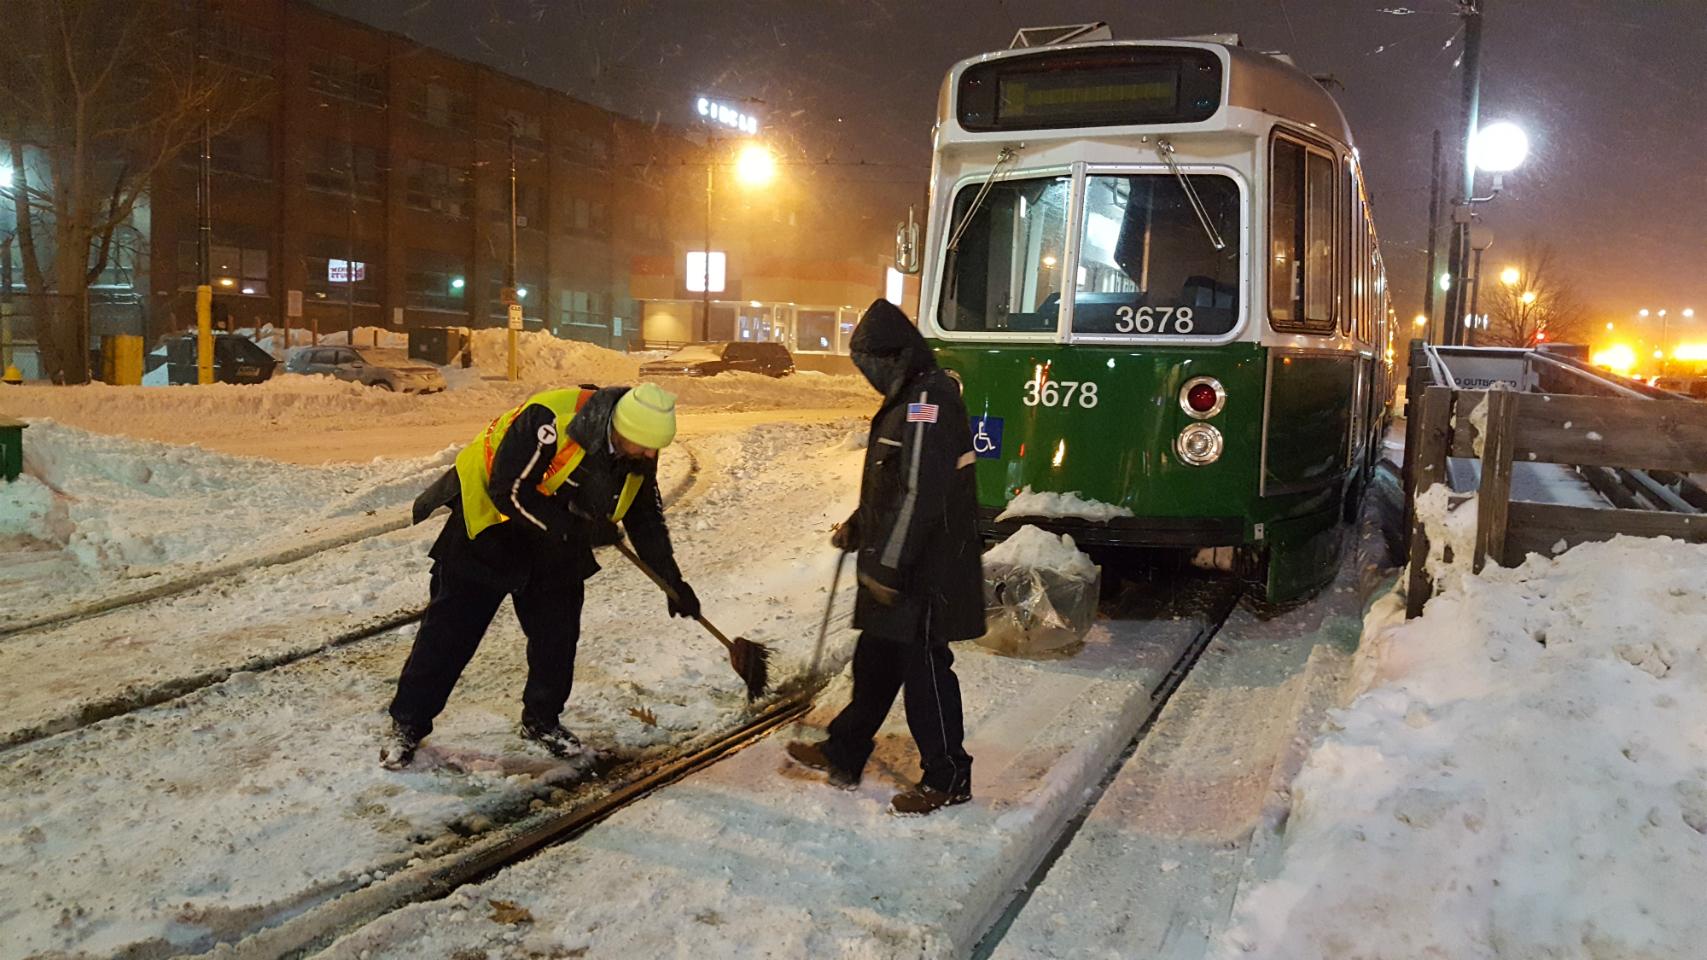 cleveland-circle-train-crew-track.jpg